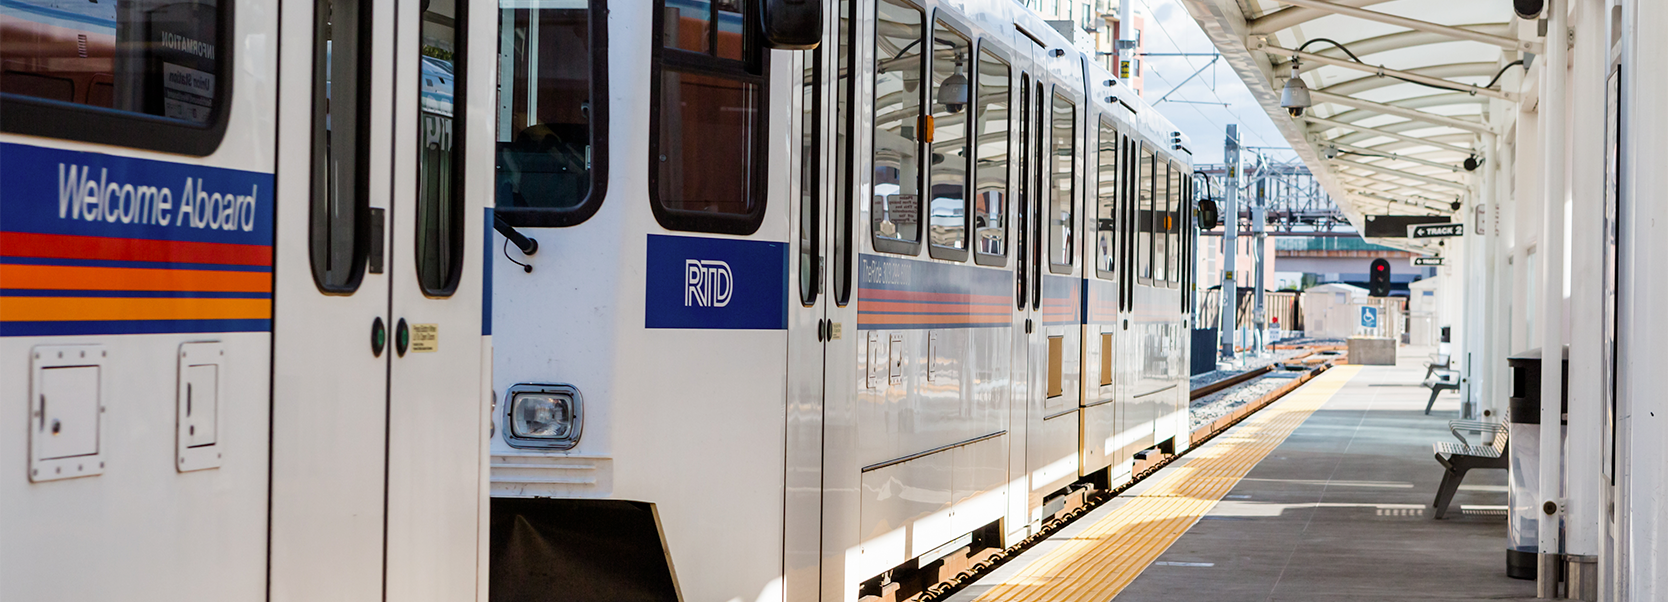 RTD Lightrail at Denver Union Station